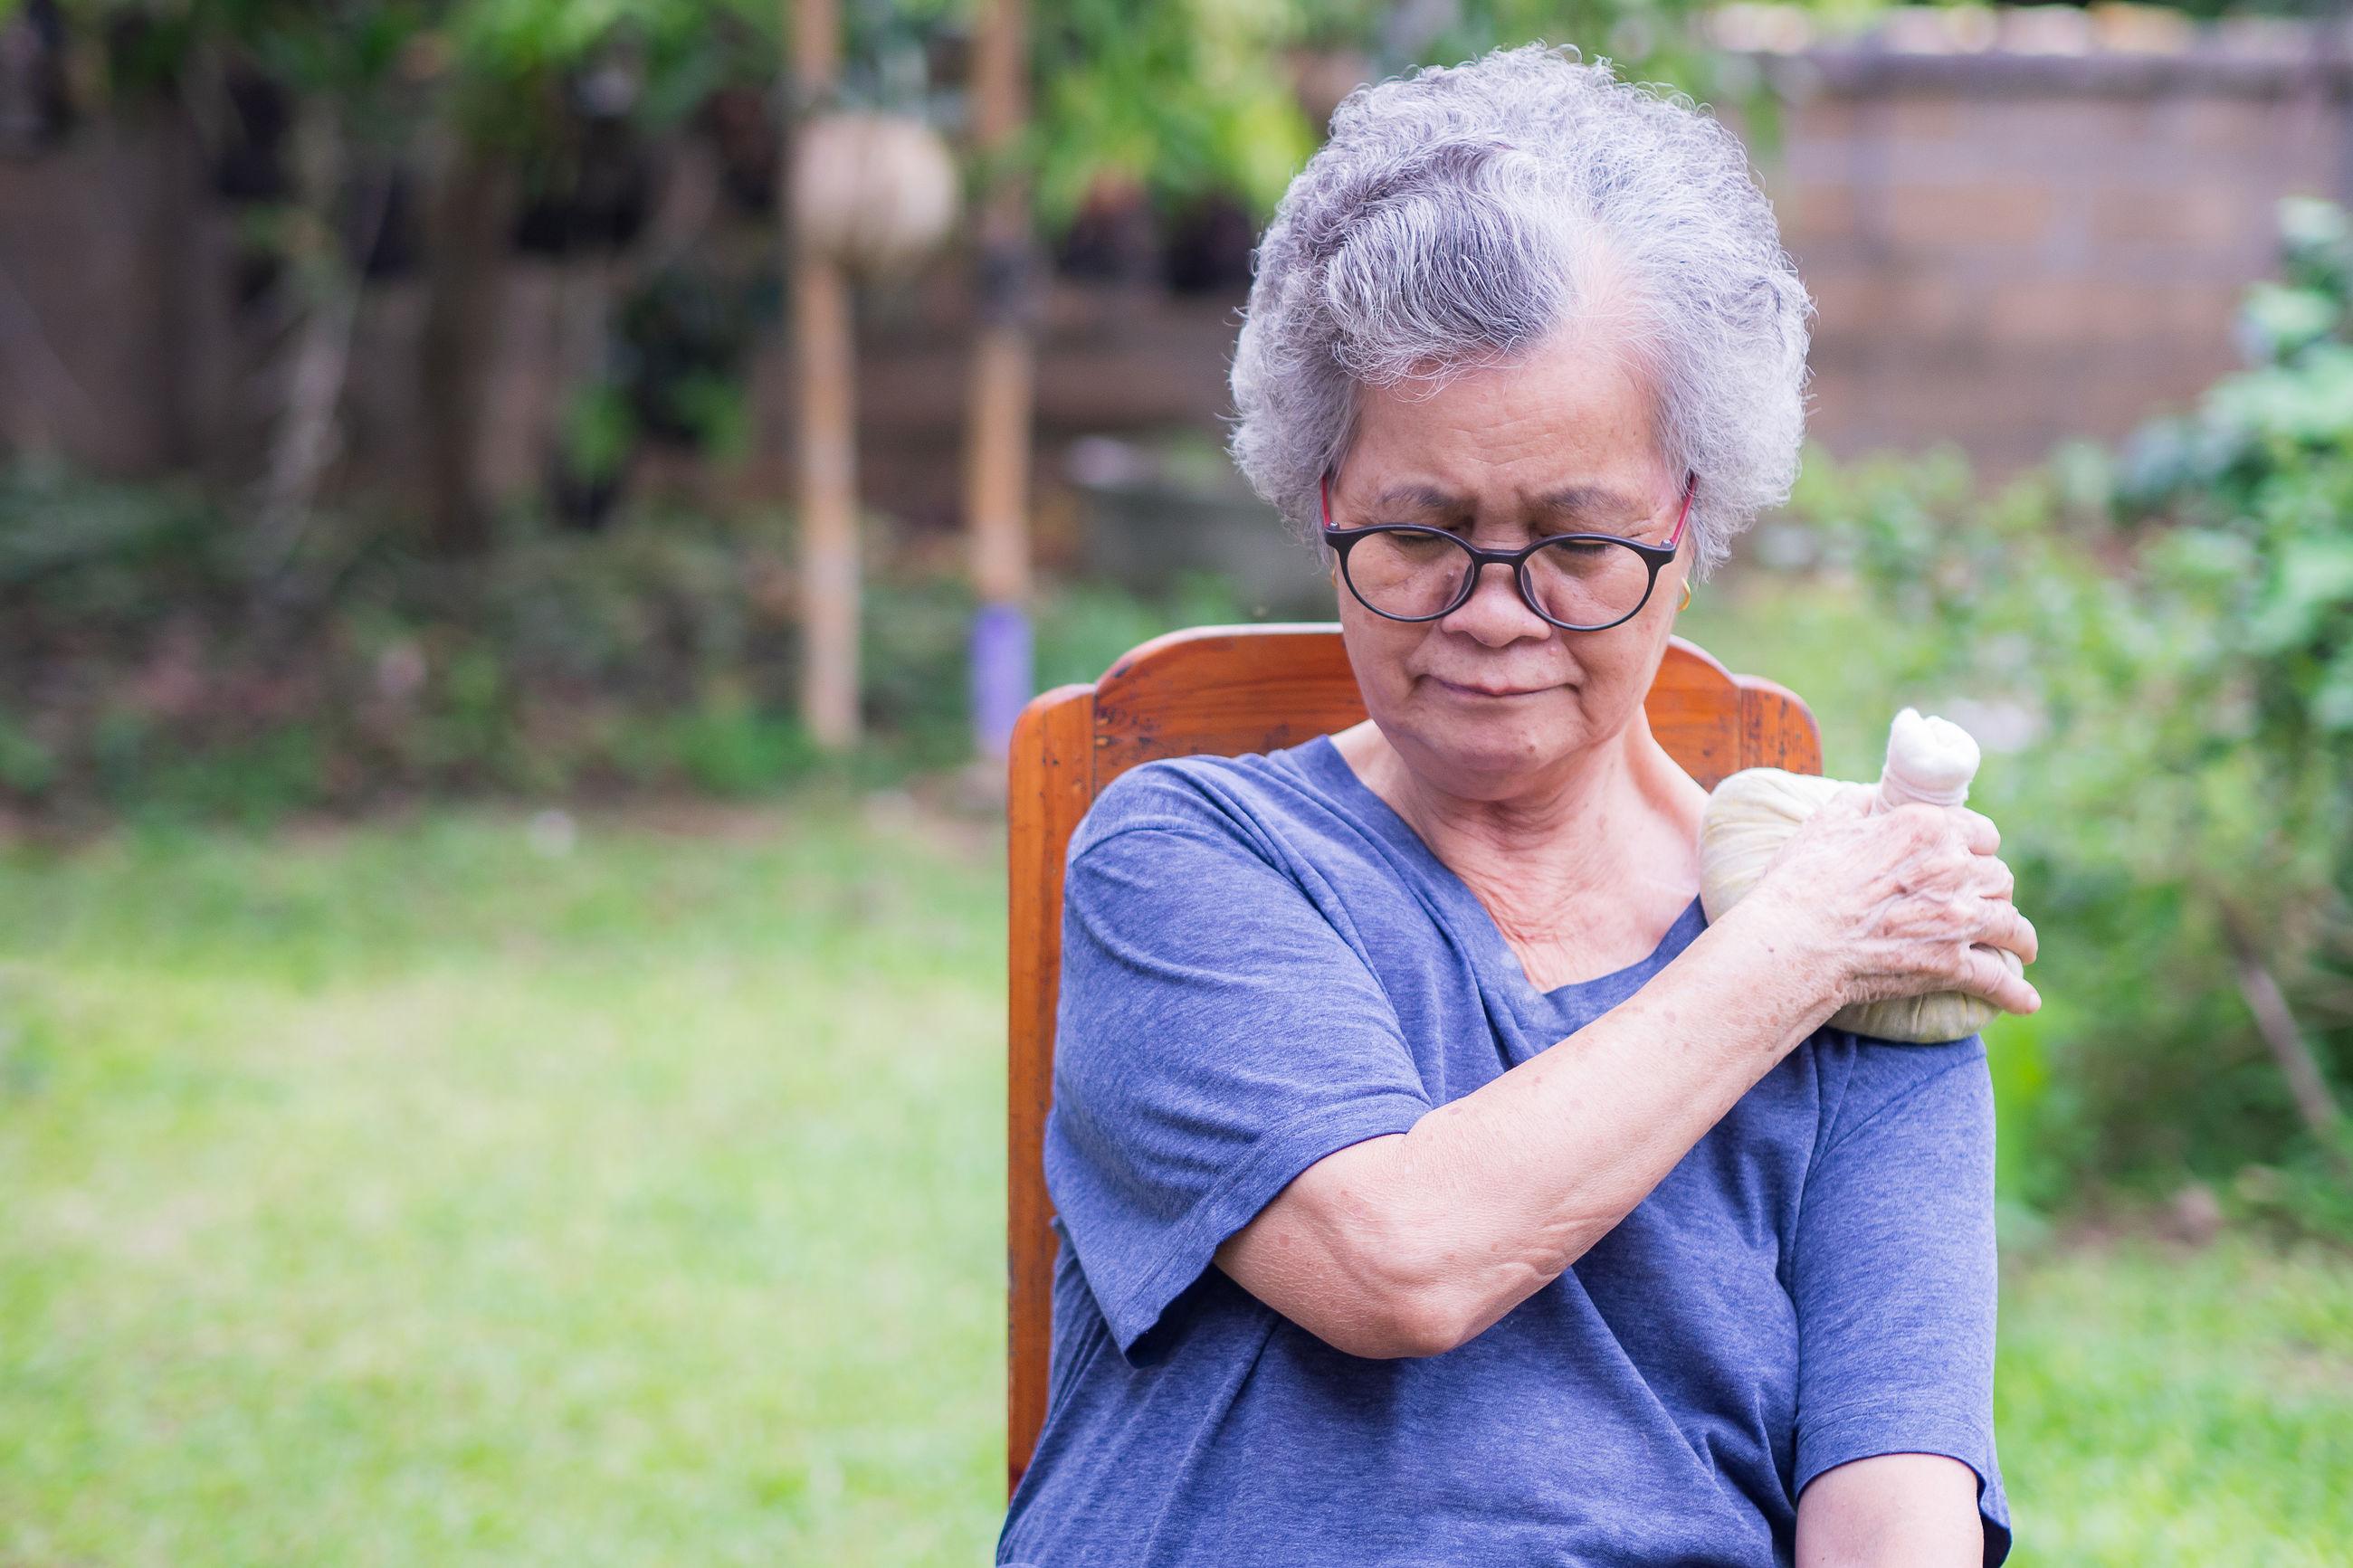 Elderly woman having shoulder pain use thai herbal compress ball on shoulder.